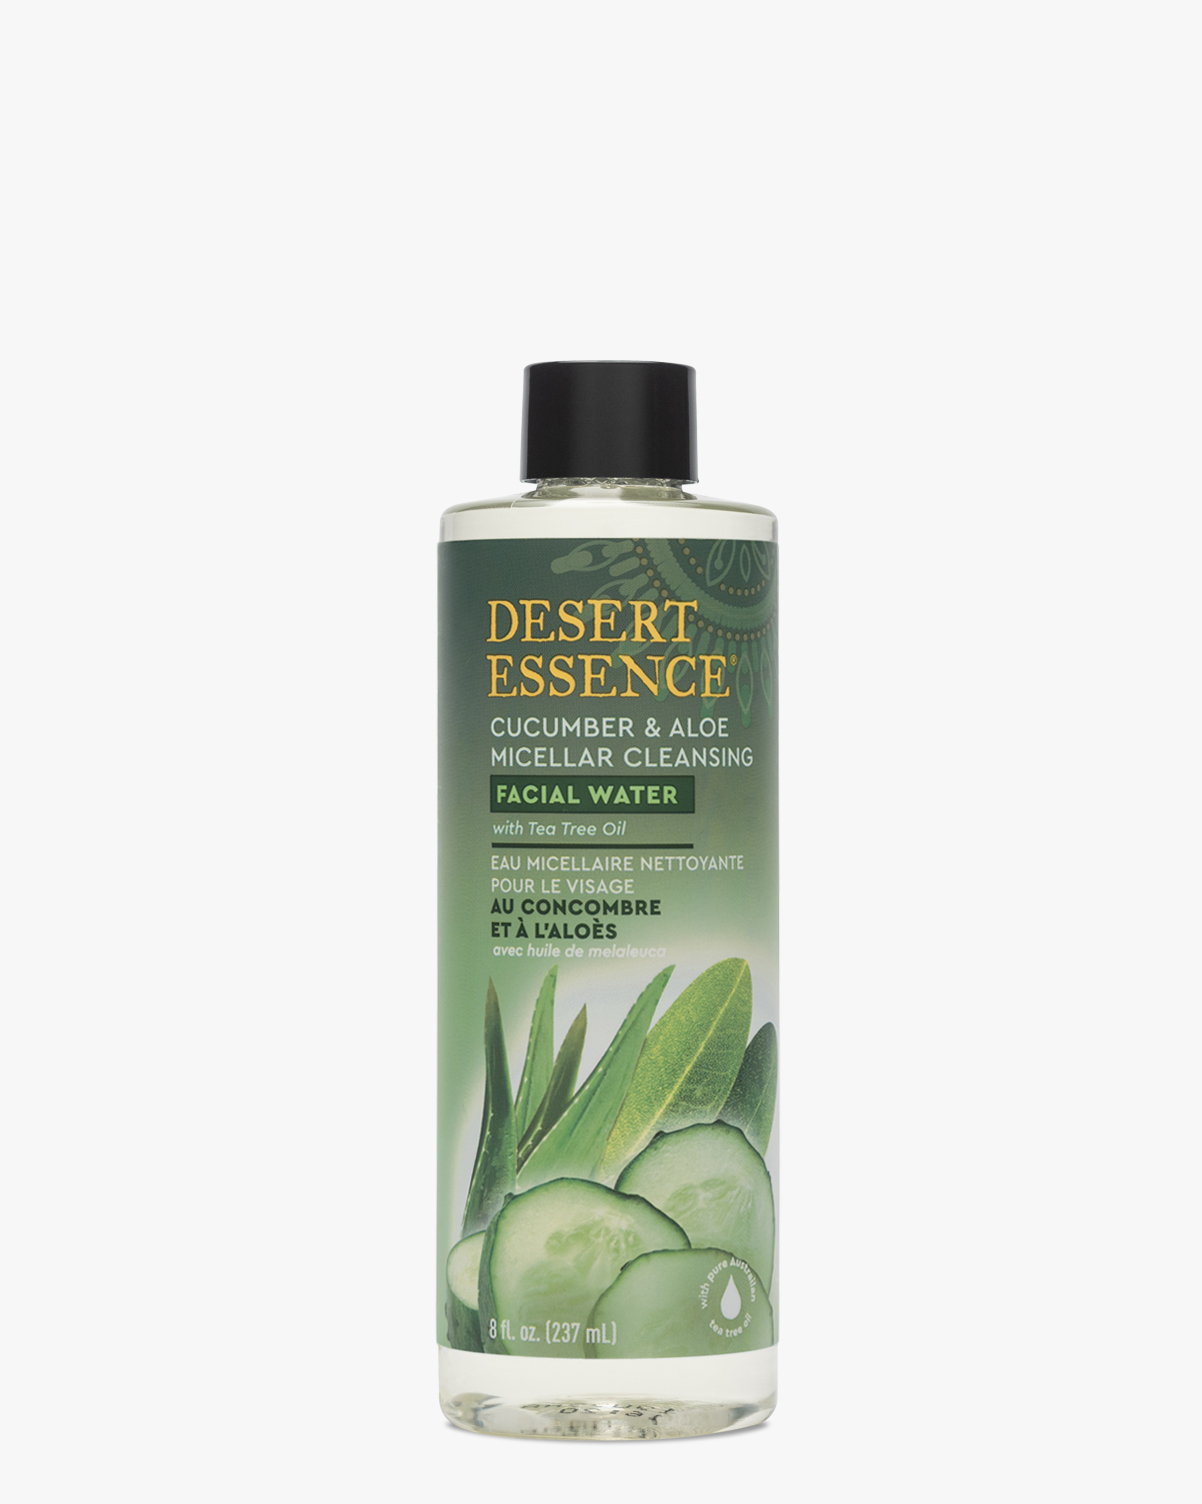 Desert Essence coupon: Desert Essence Cucumber & Aloe Micellar Cleansing Facial Water, 8.0 fl. oz. | Vegan | Gluten-Free